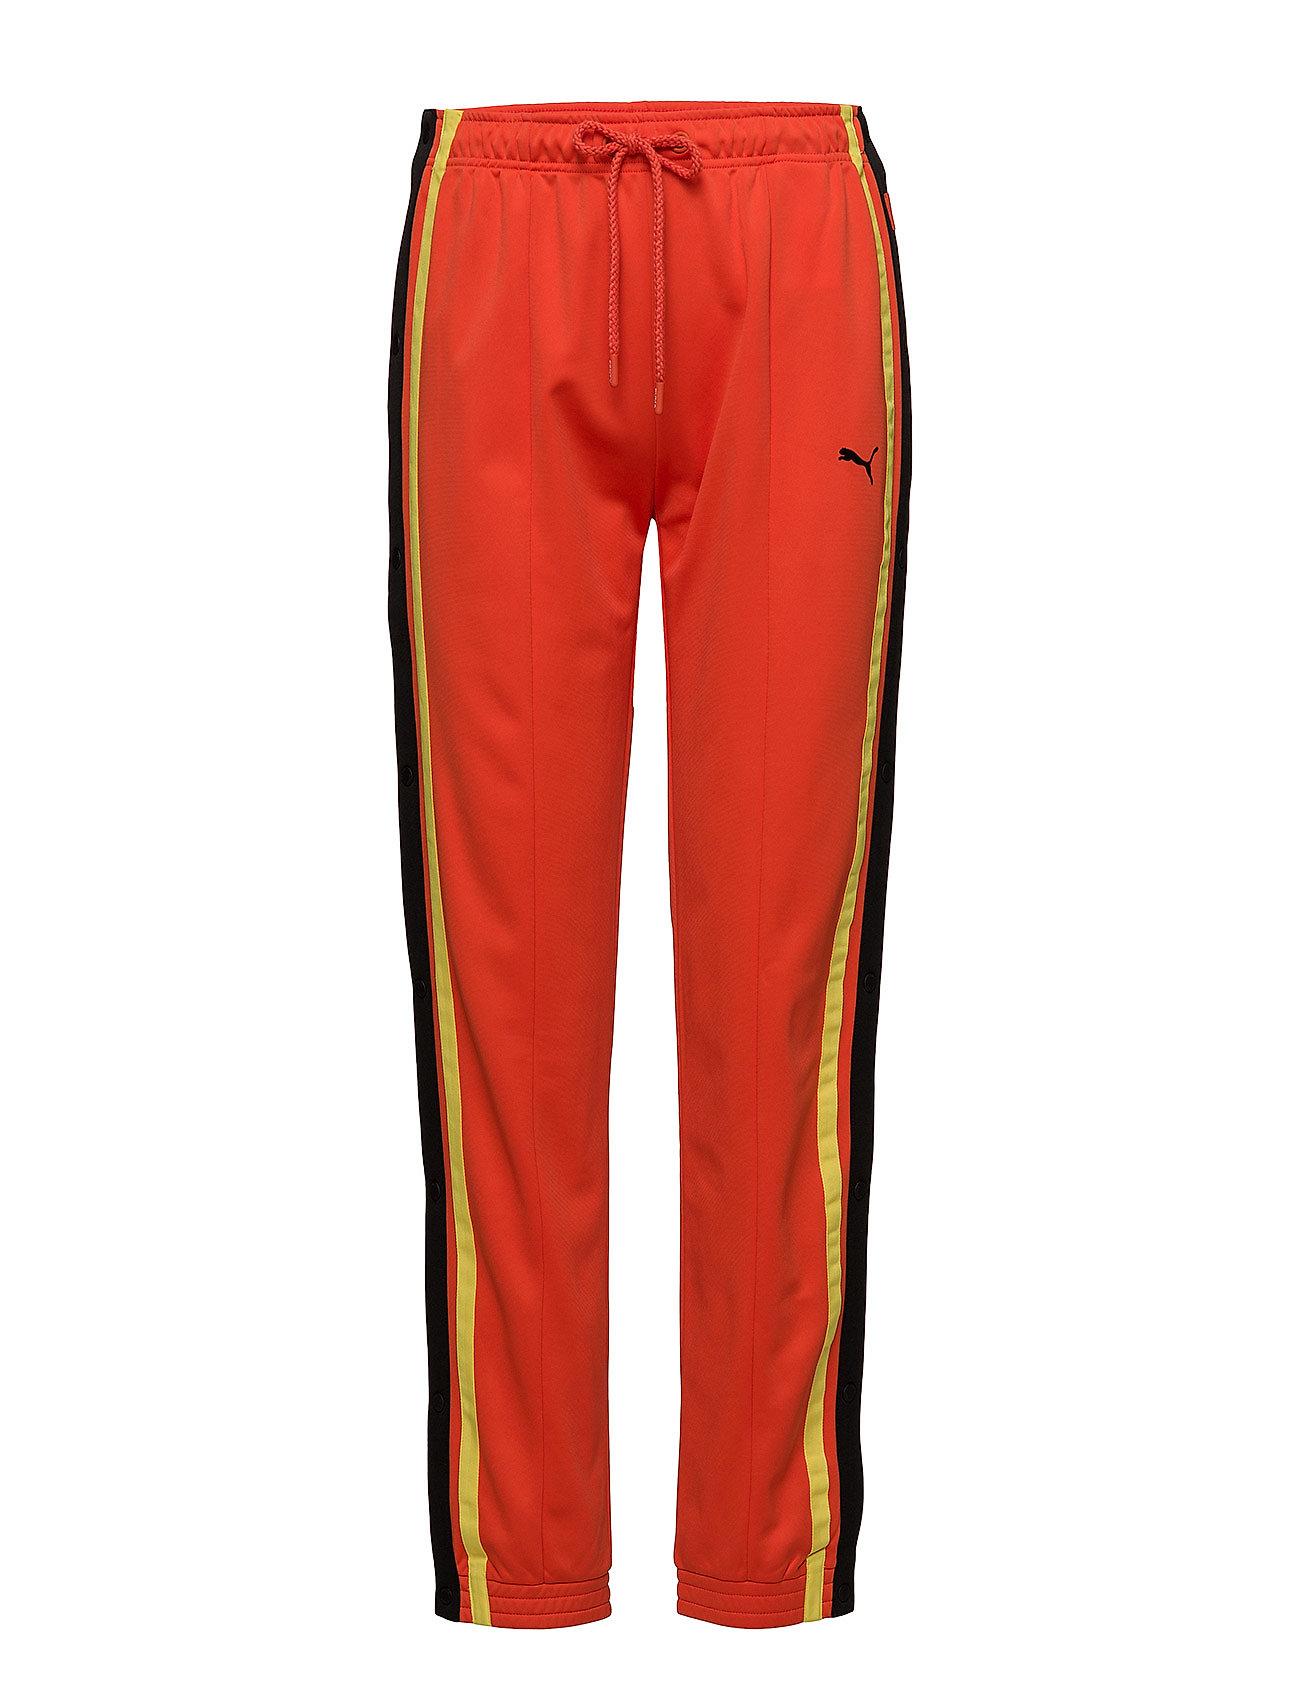 7d93d31b161 Tearaway Track Pant Wns Sweatpants Hyggebukser Orange FENTY PUMA BY RIHANNA